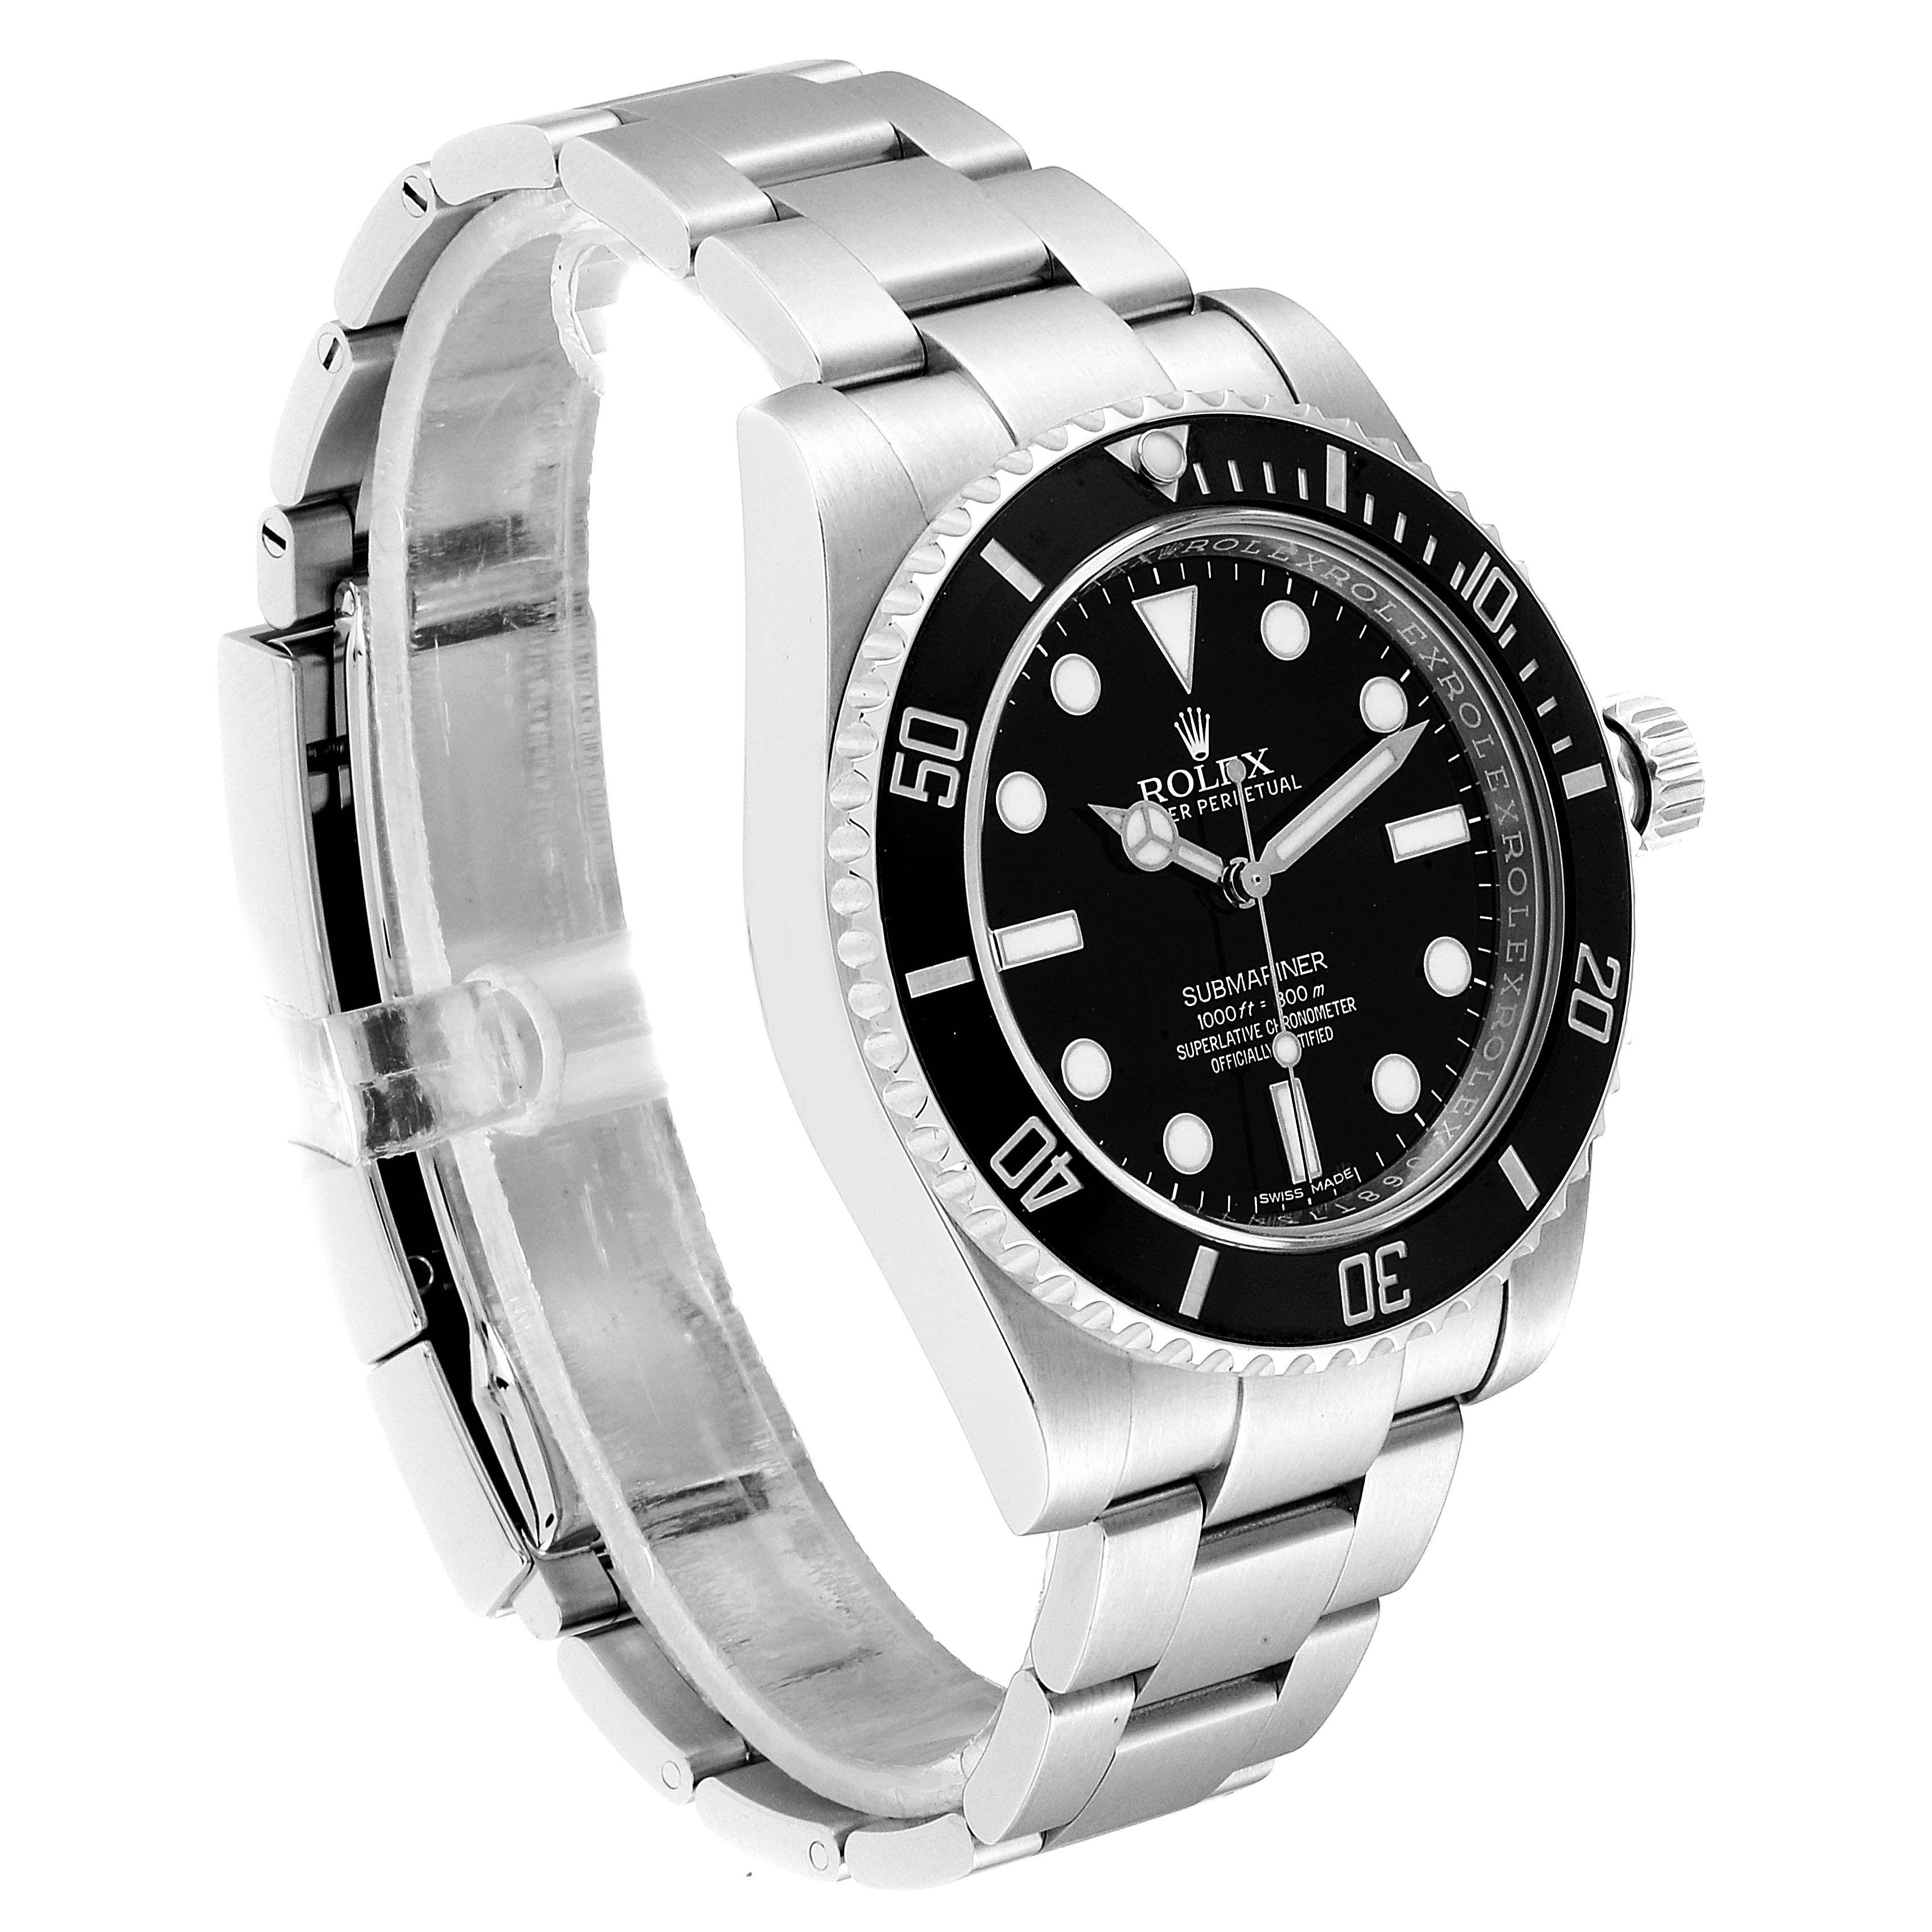 Rolex Submariner Ceramic Bezel Steel Mens Watch 116610 Box Card Swisswatchexpo In 2020